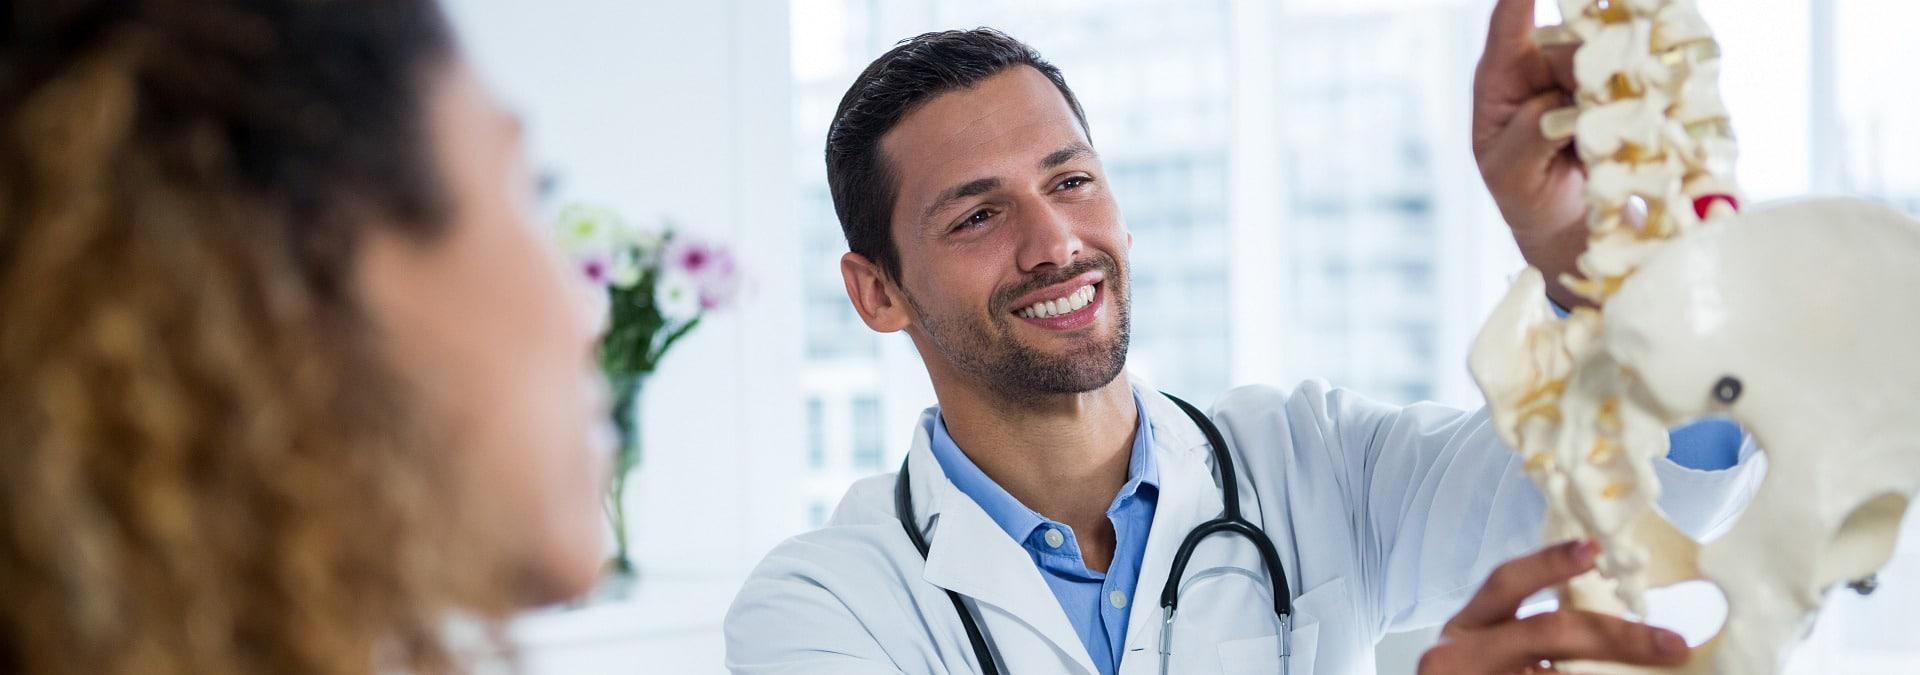 medicina-naslovna